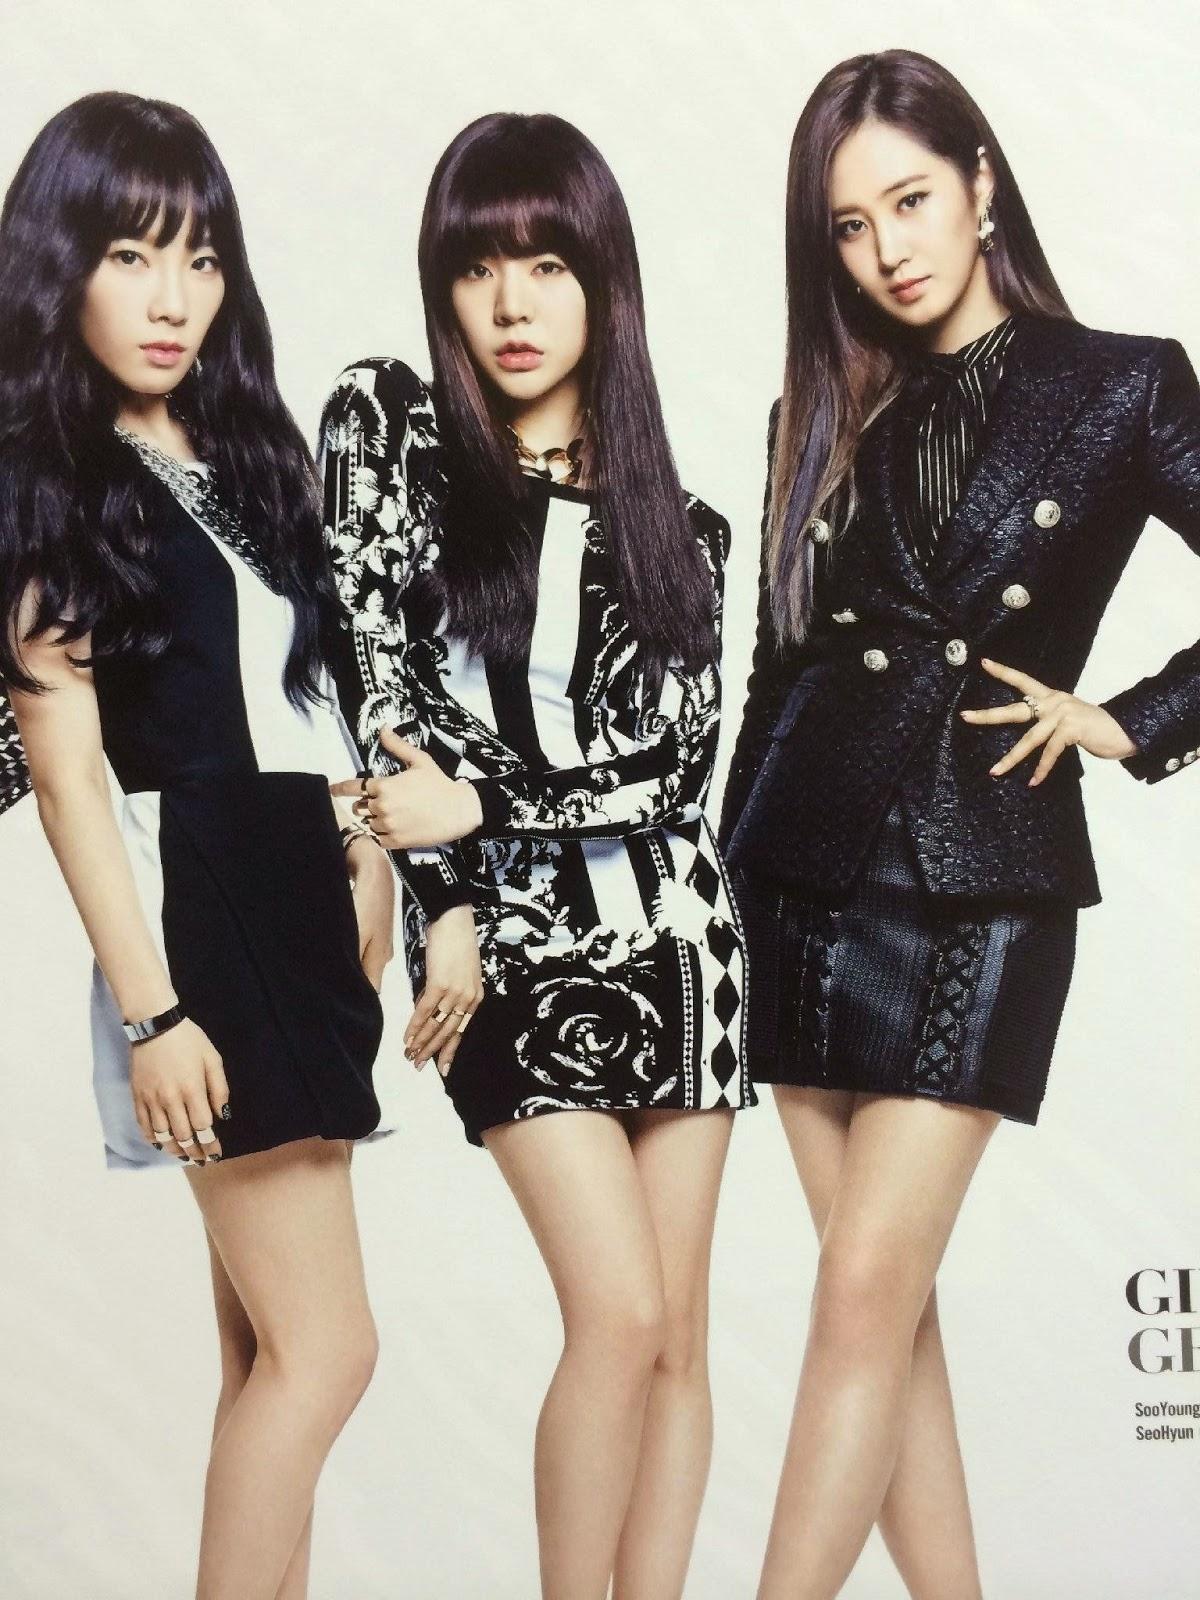 SNSD Girls Generation The Best Scan Photos 4